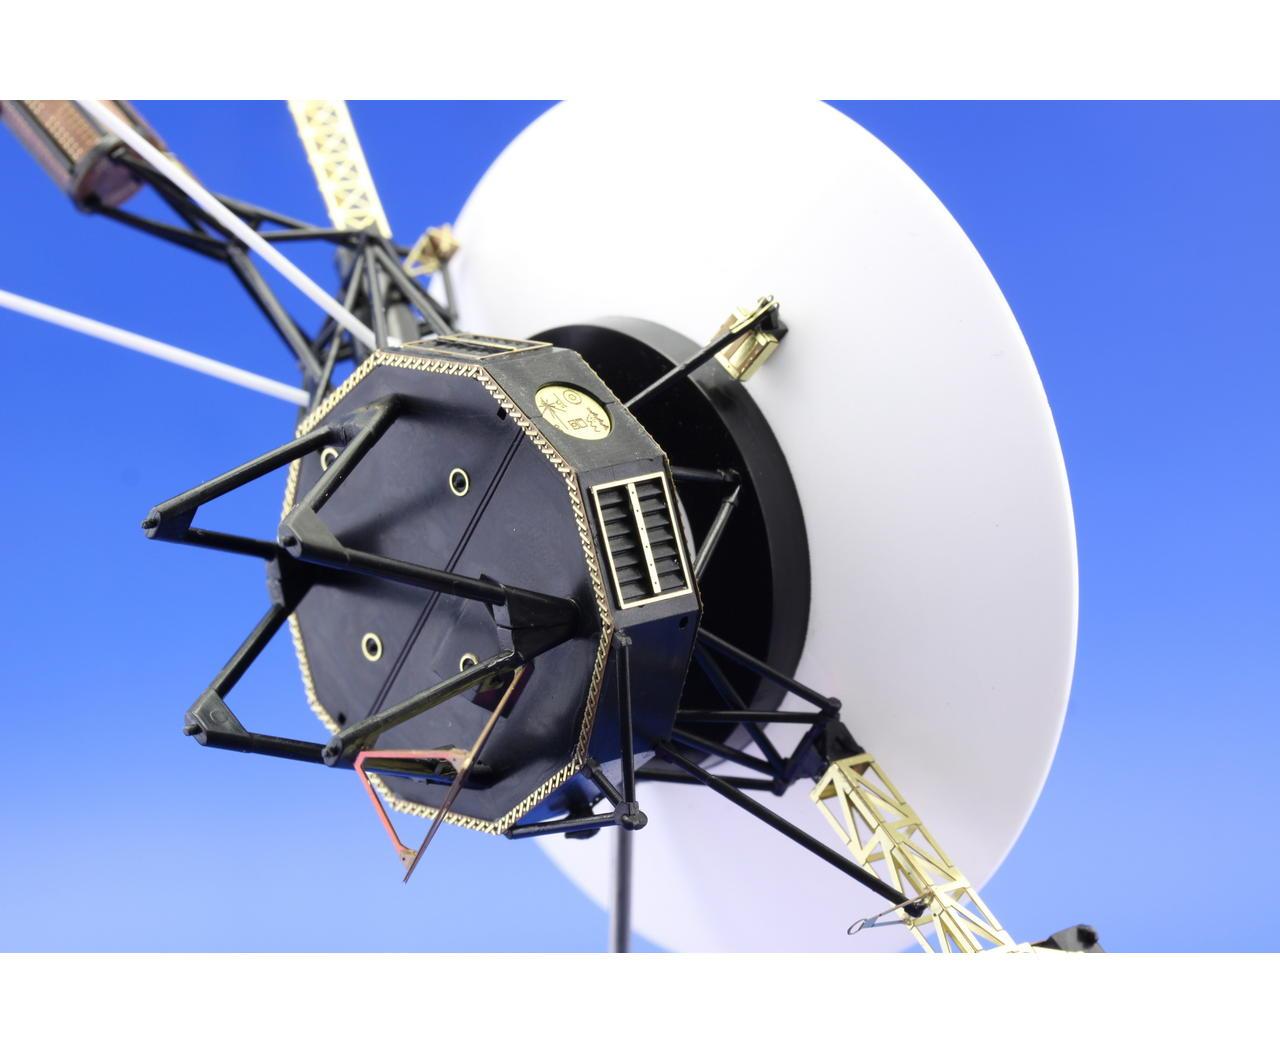 space probe models - photo #20